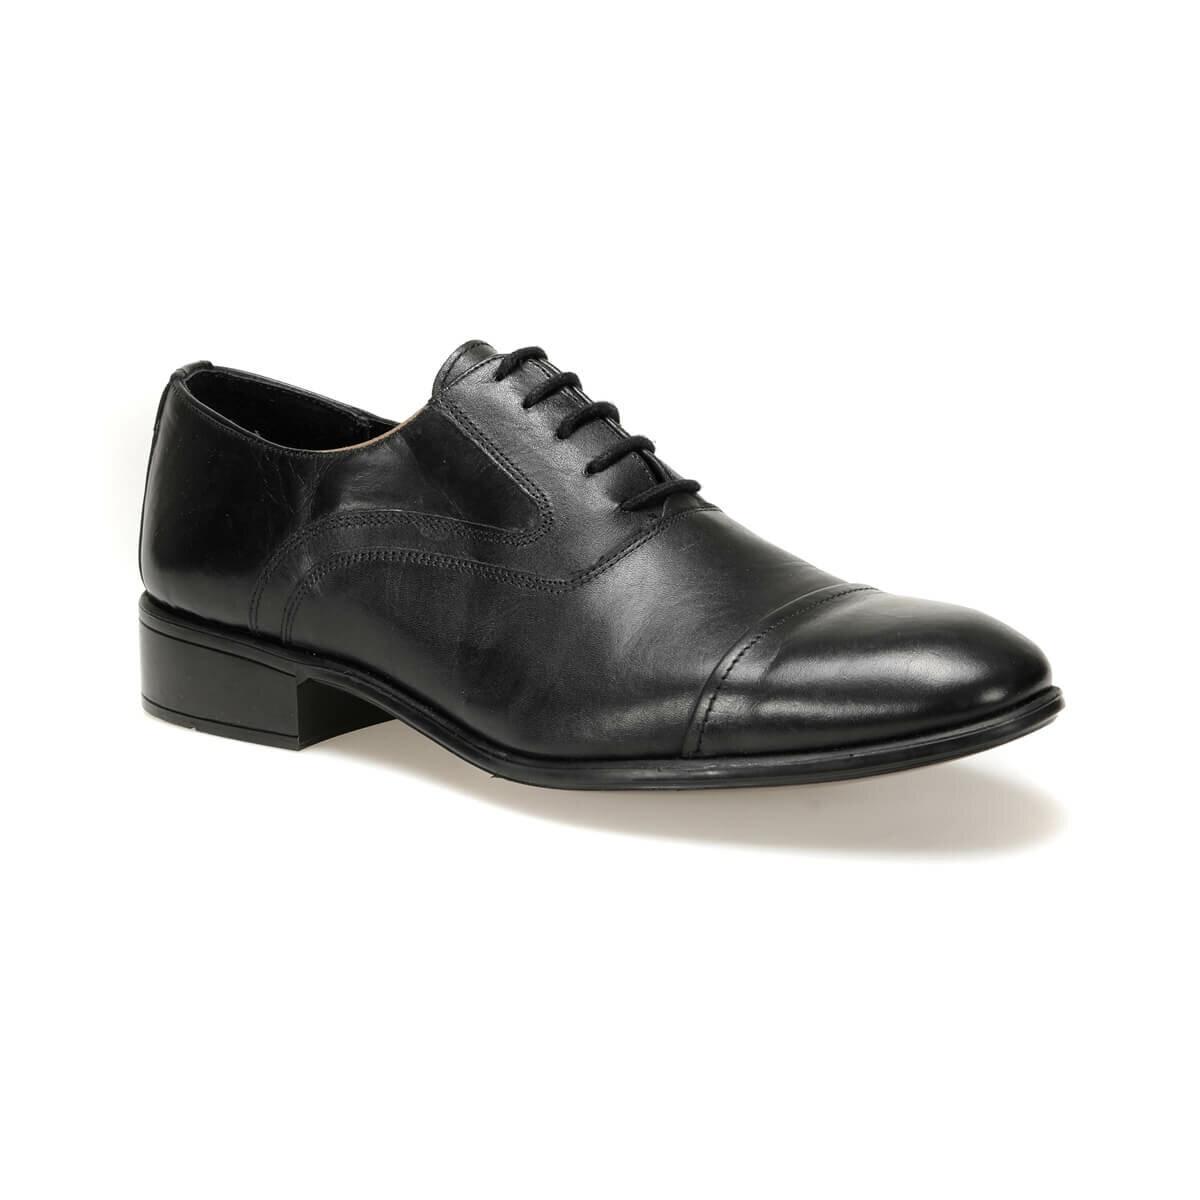 Flo 1018 C 19 Zwarte Mannen Klassieke Schoenen Garamond